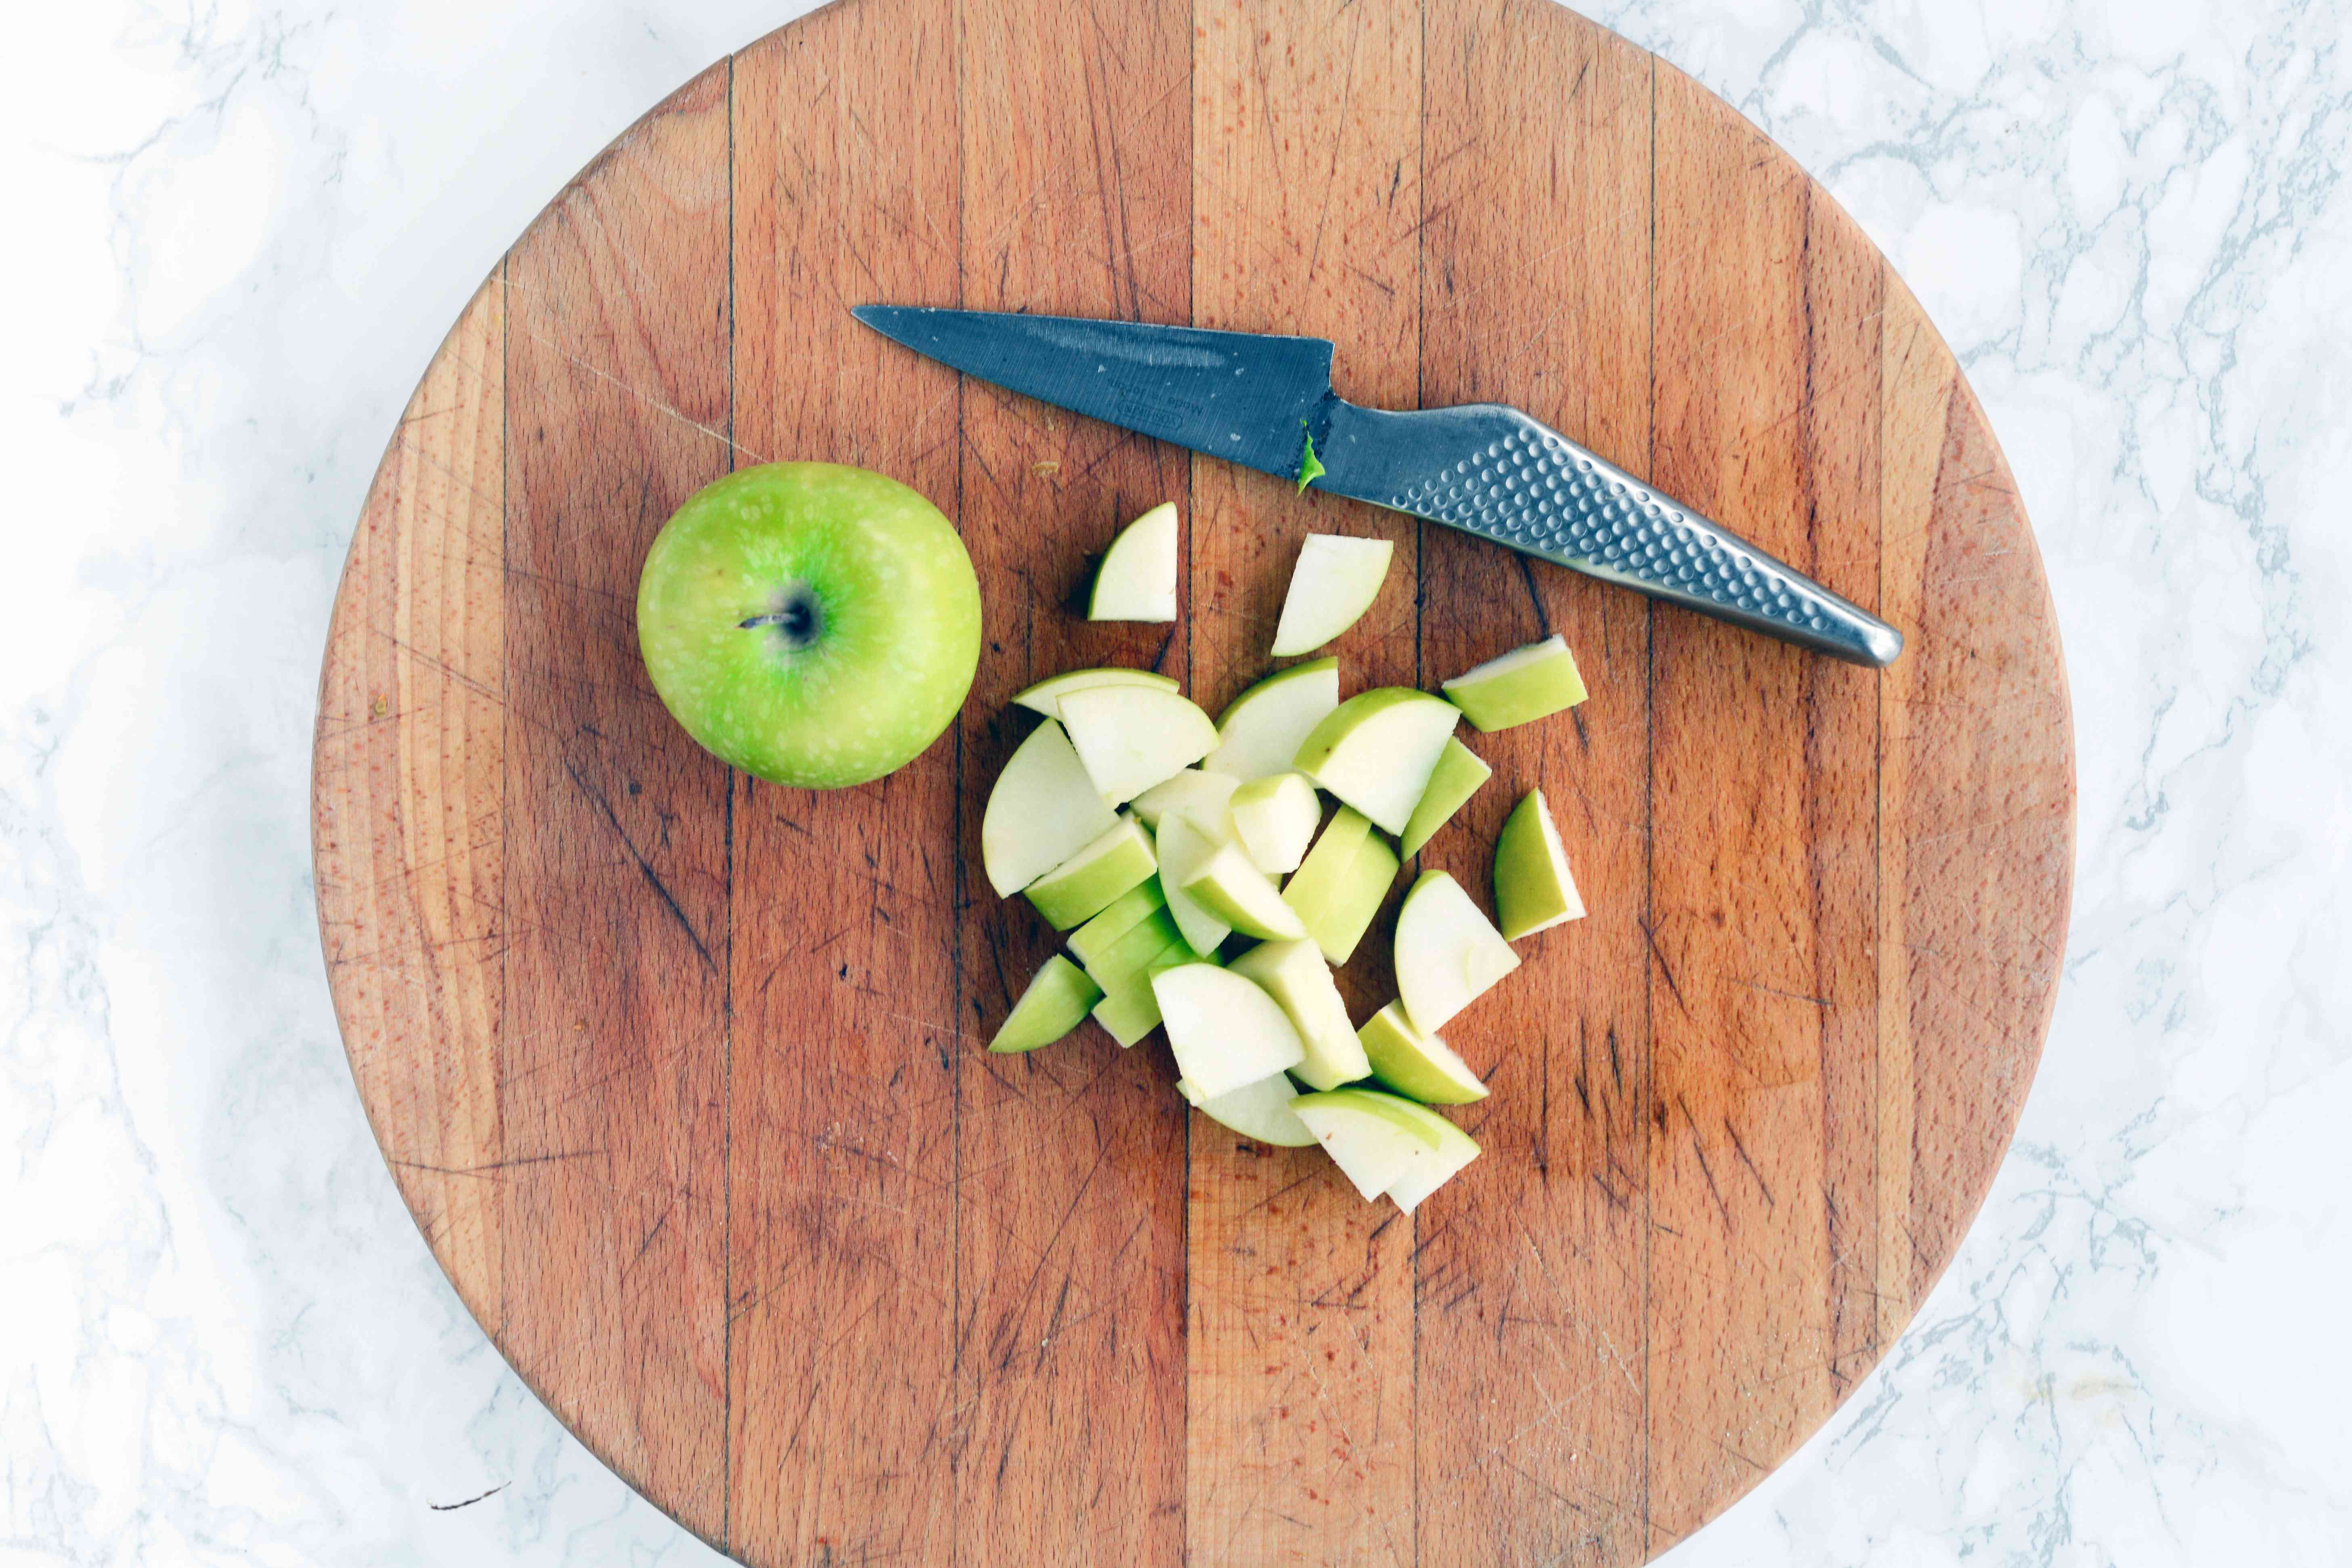 Chopped apples for apple walnut salad